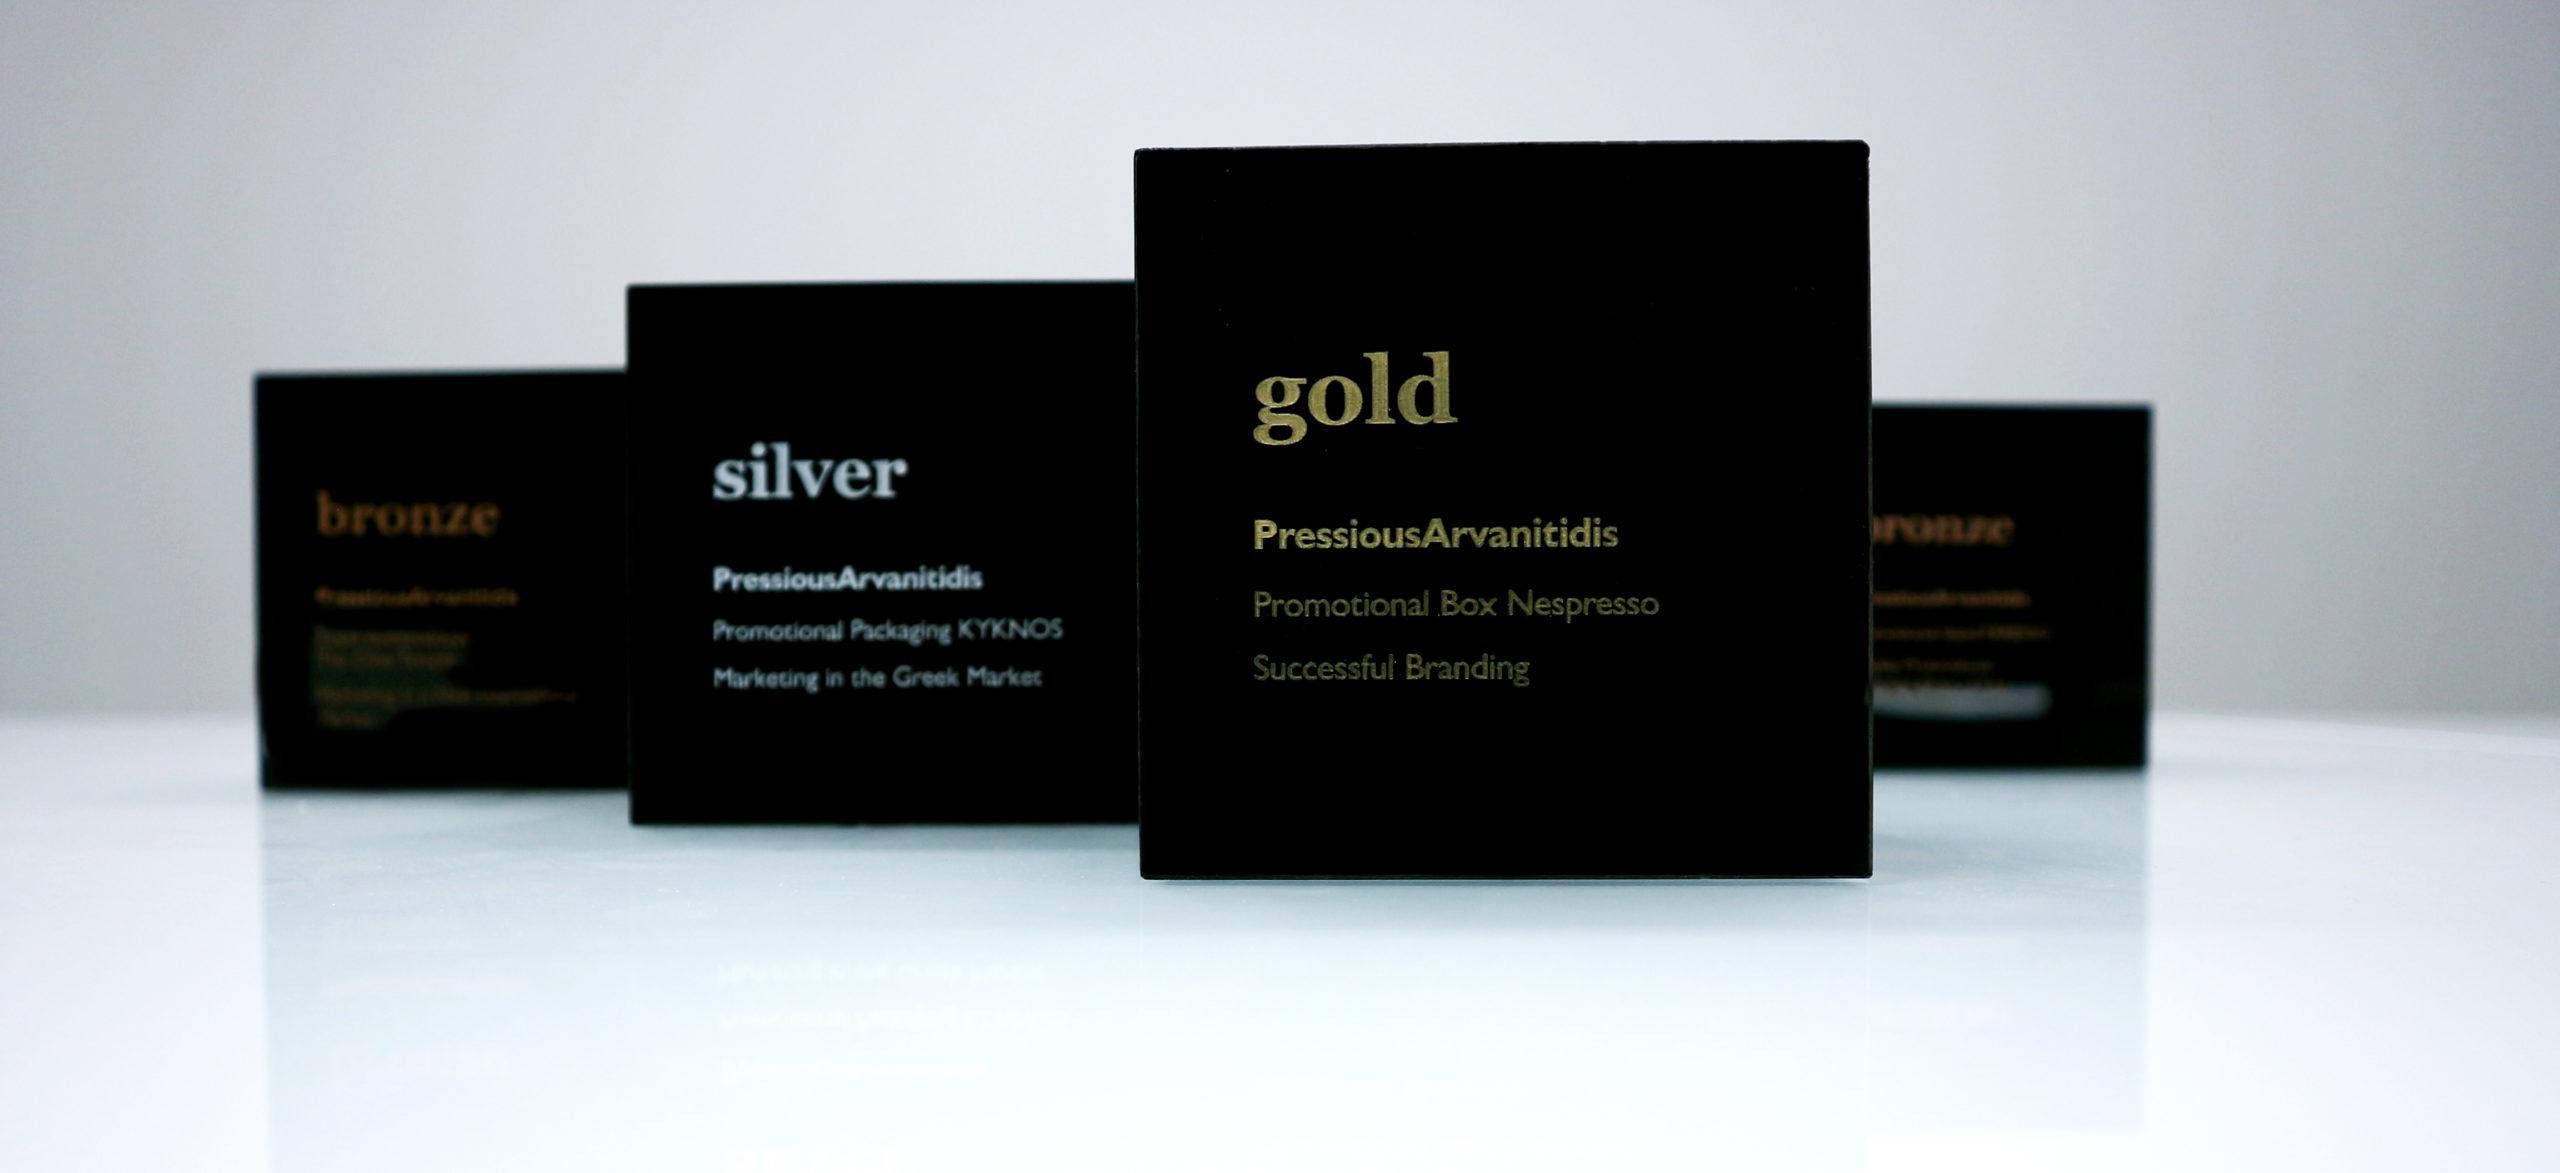 H PressiousArvanitidis αναδείχτηκε με 4 βραβεία στα Packaging Awards 2021